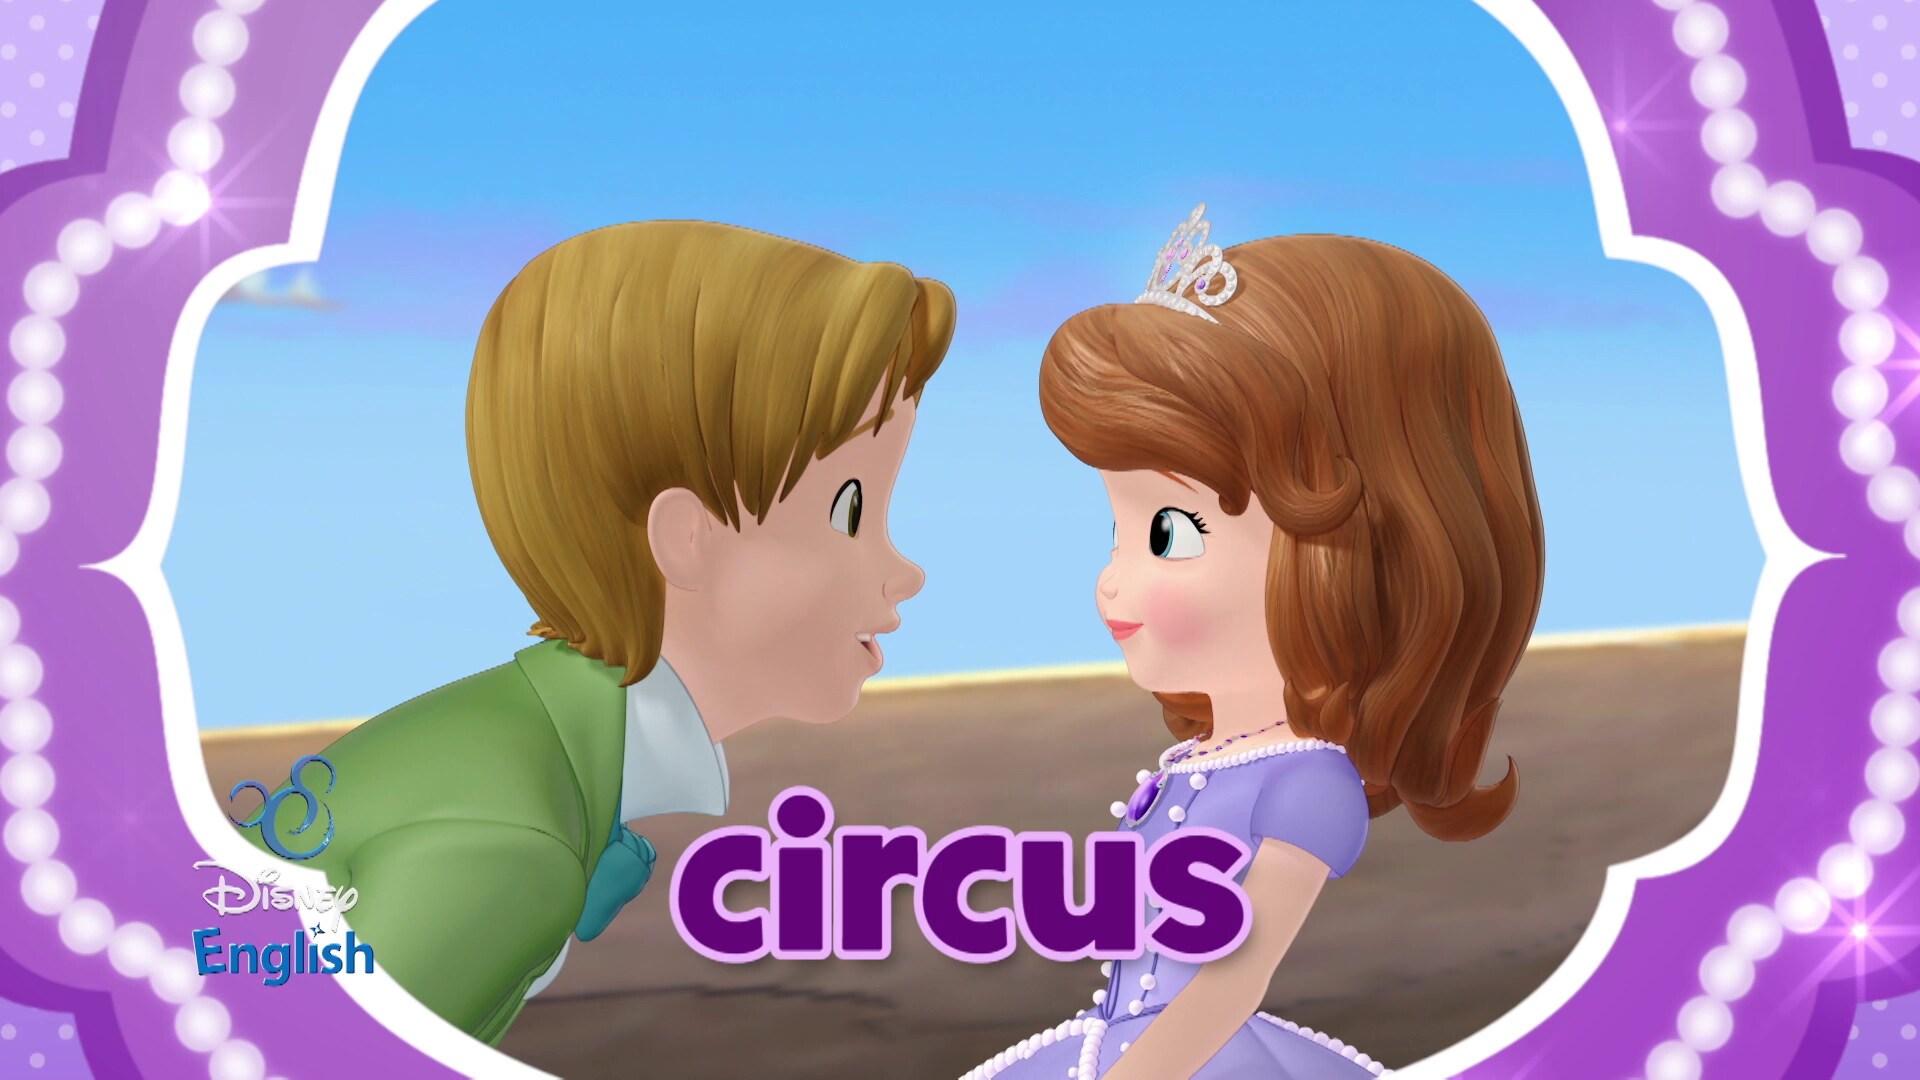 Disney English - Circus